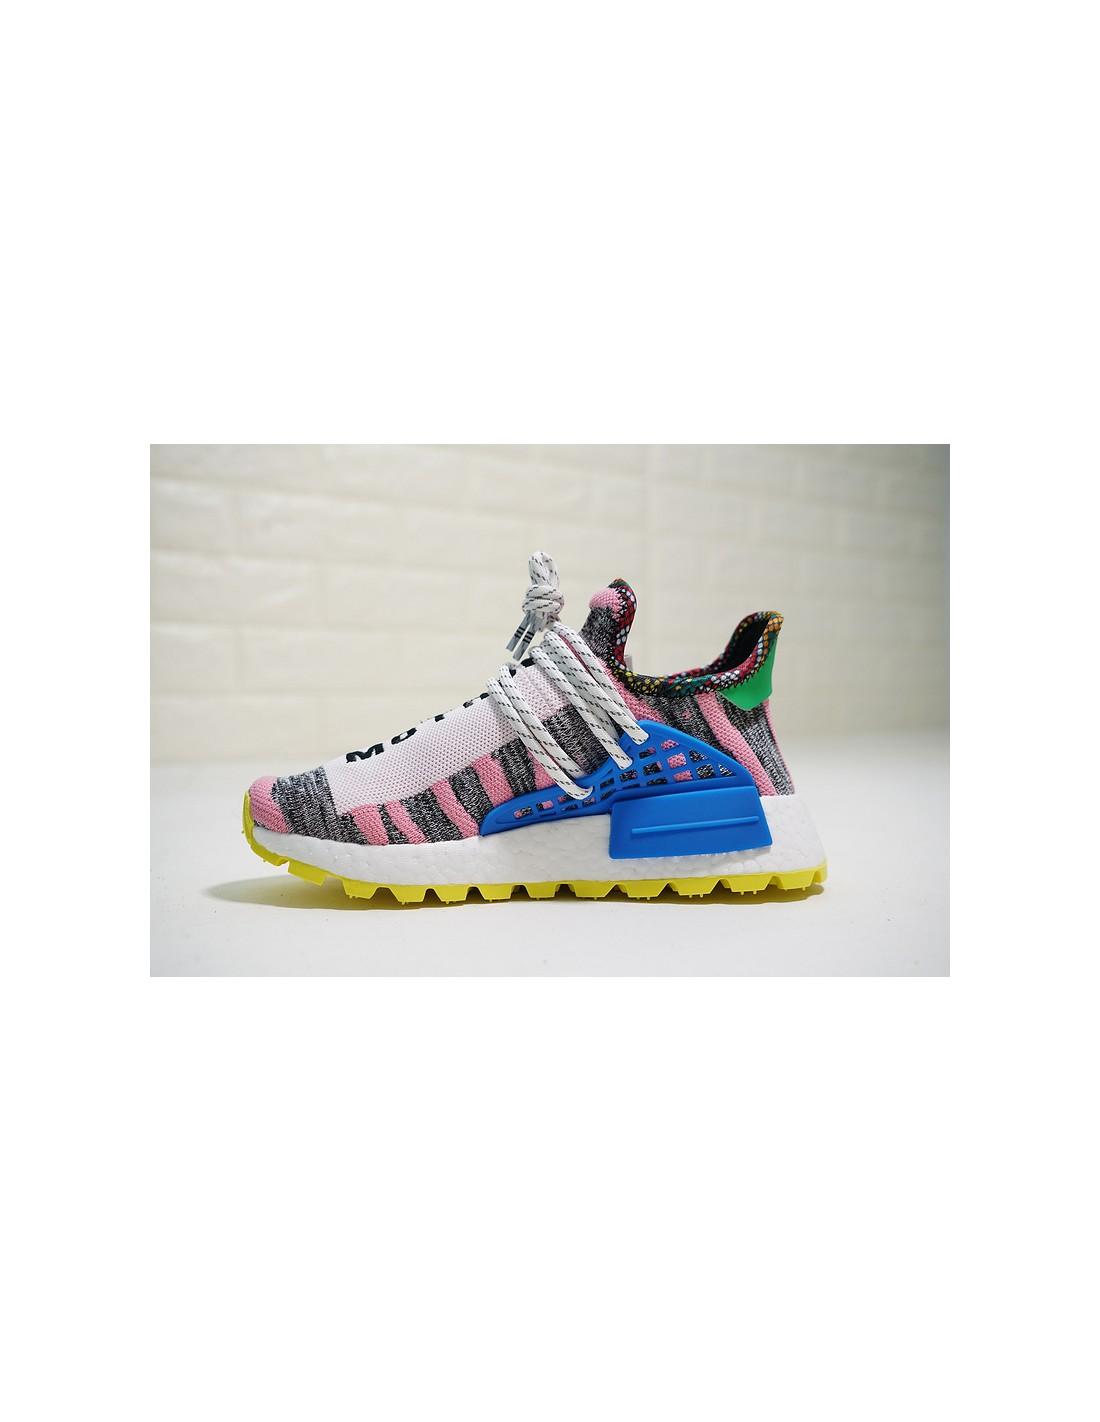 adidas NMD Hu Inspiration Pack Release Date Sneaker Bar